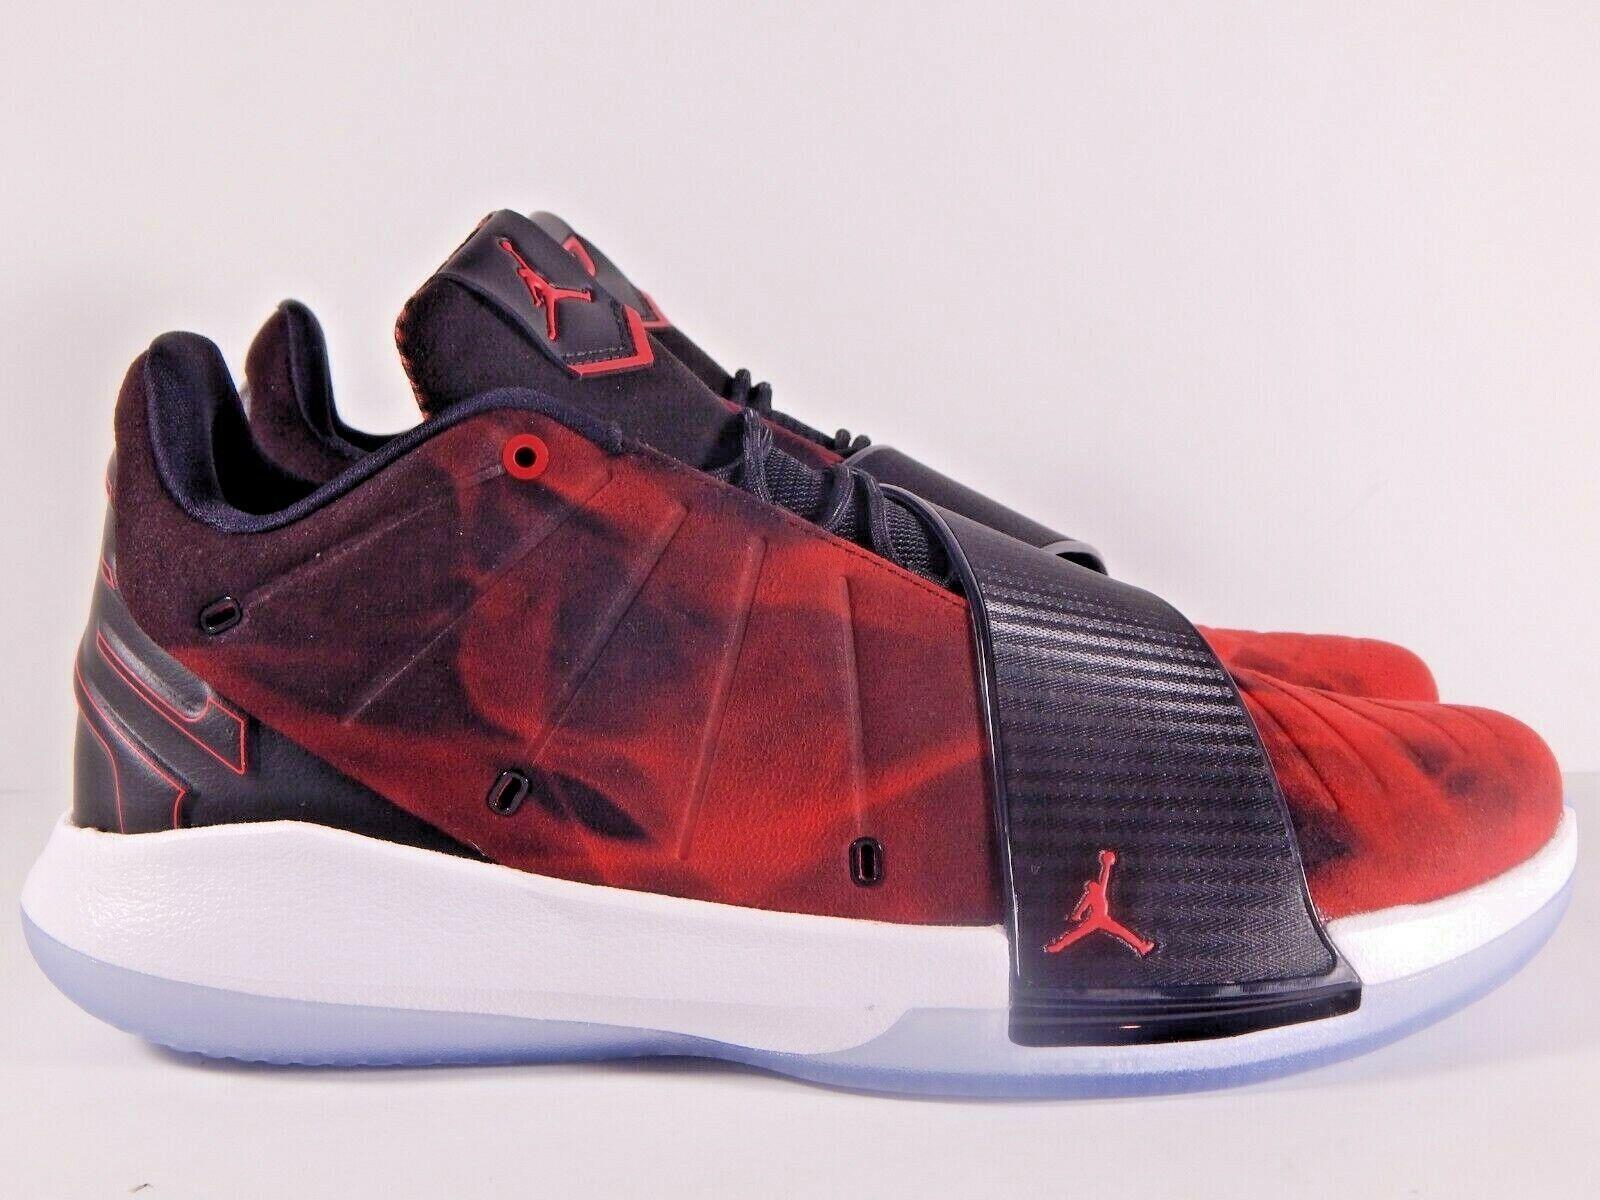 New Men's Nike Jordan CP3 Chris Paul XI 11 Basketball shoes, AA1272-600 Sz 11.5